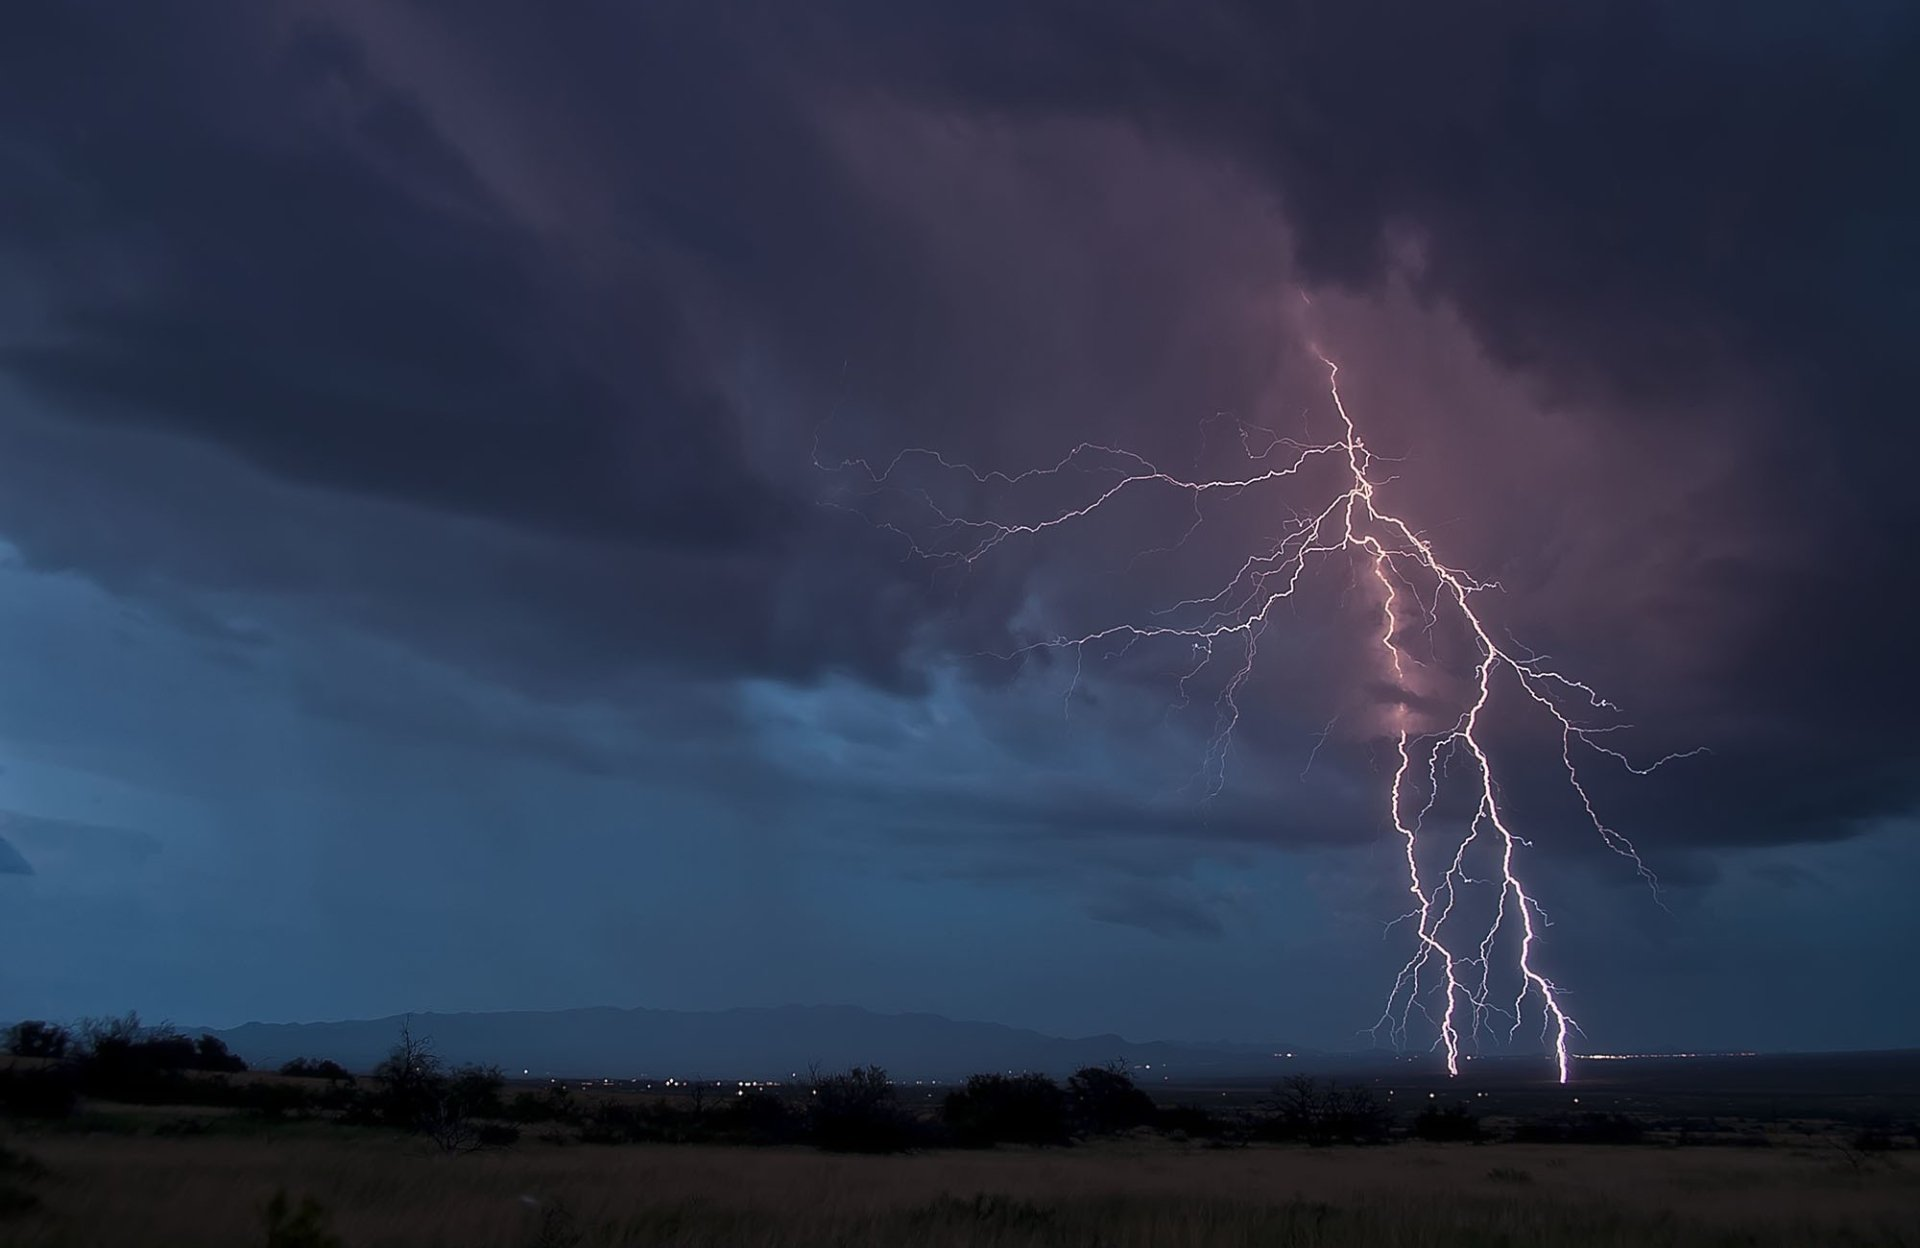 lightning hd wallpaper  background image  2000x1300  id